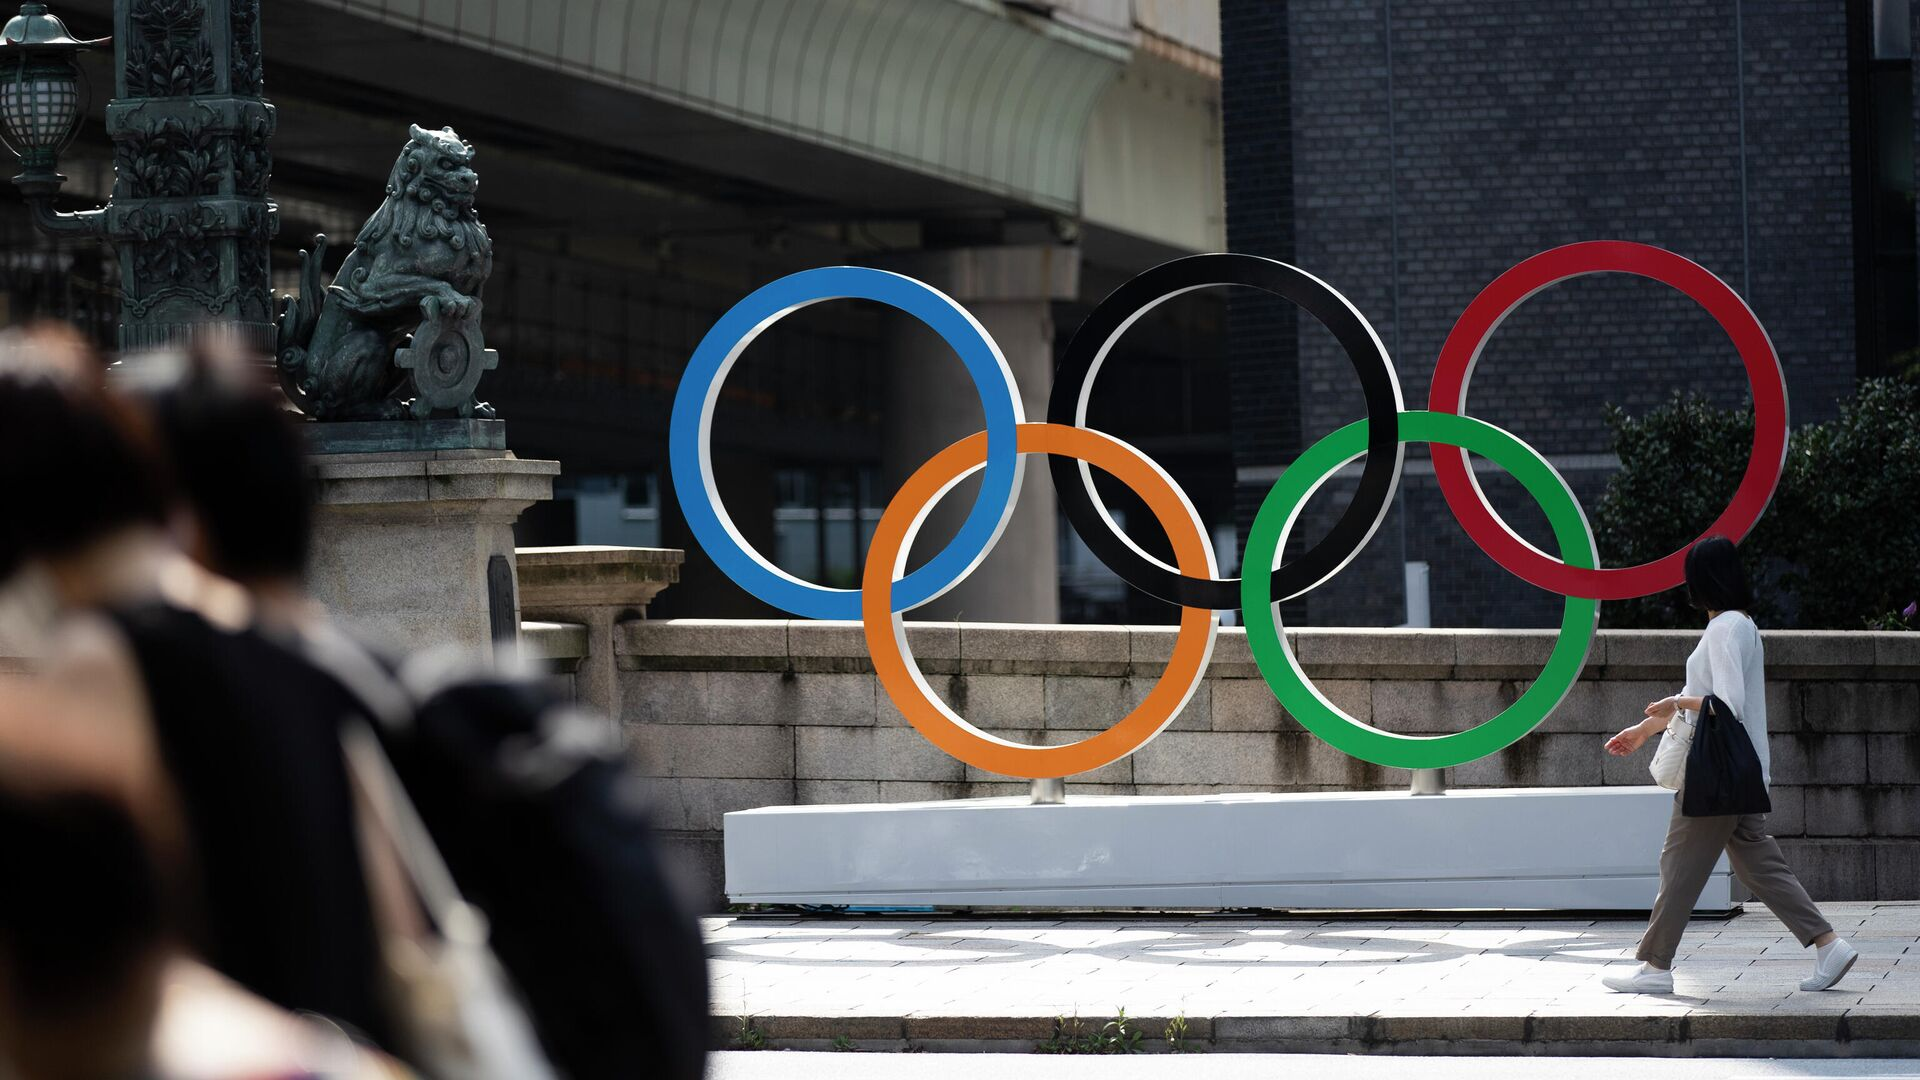 Женщина идет мимо олимпийских колец в Токио - РИА Новости, 1920, 22.07.2021